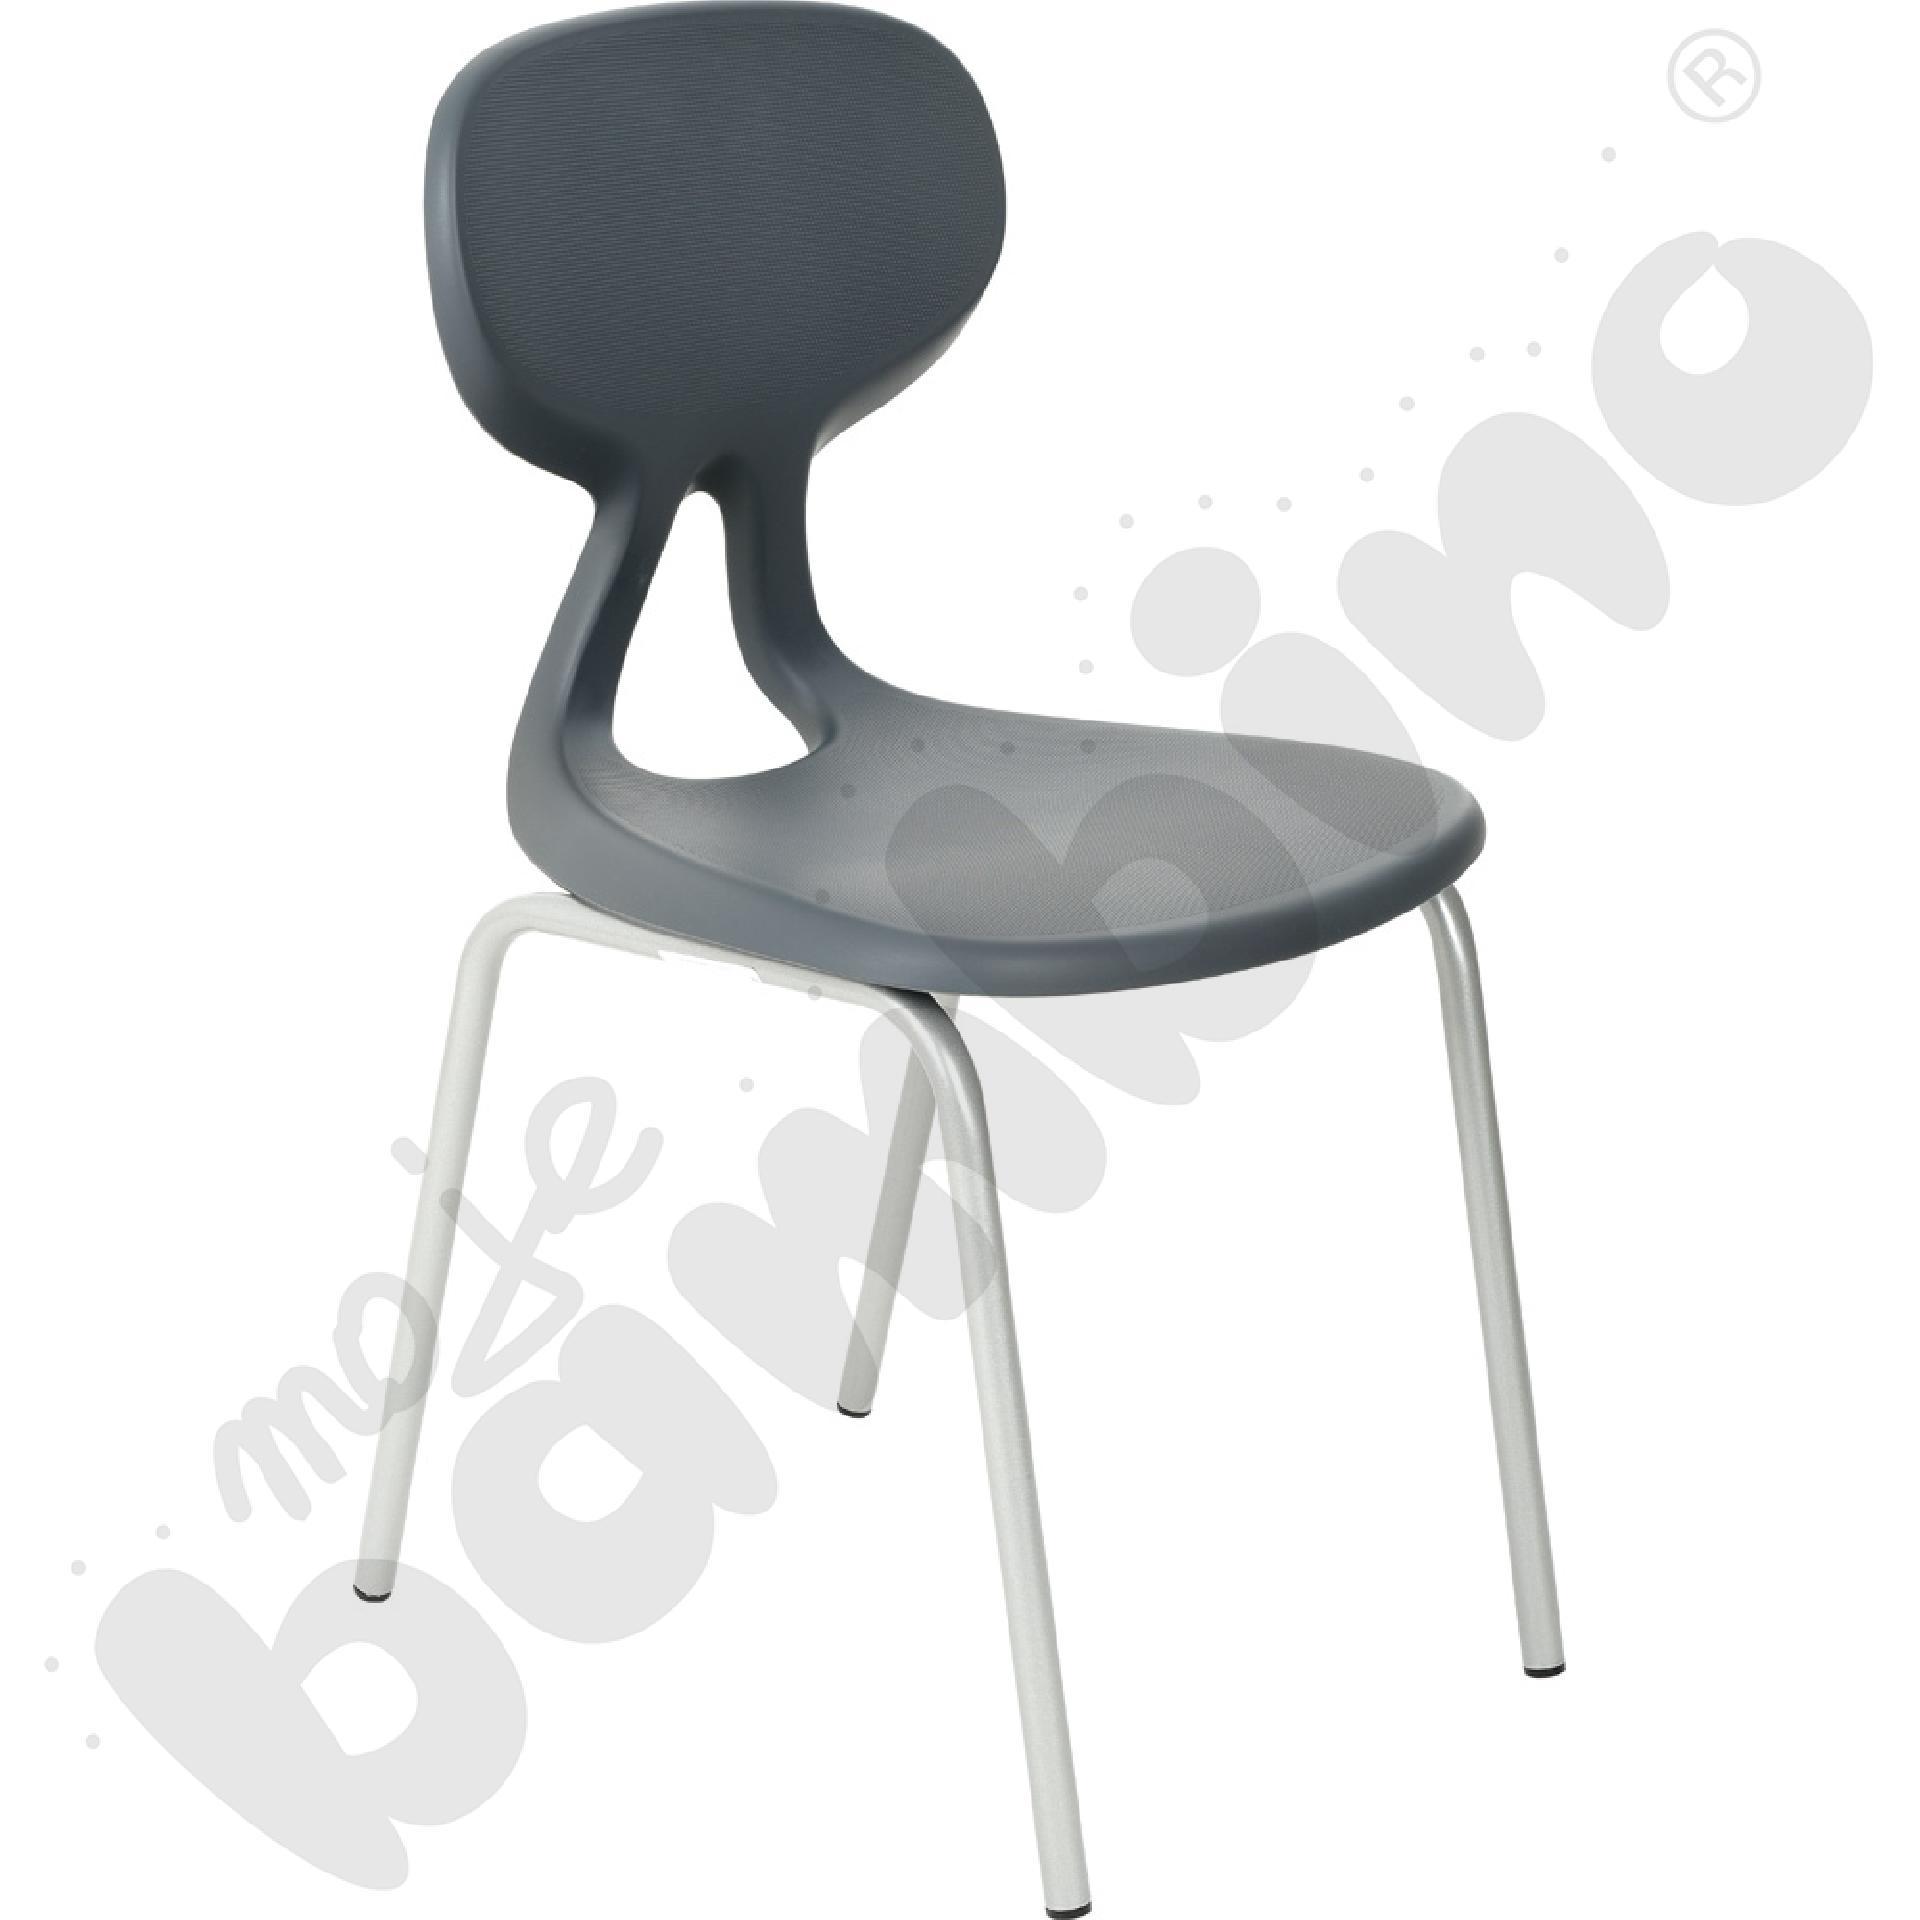 Krzesło Colores rozm. 4 - szare